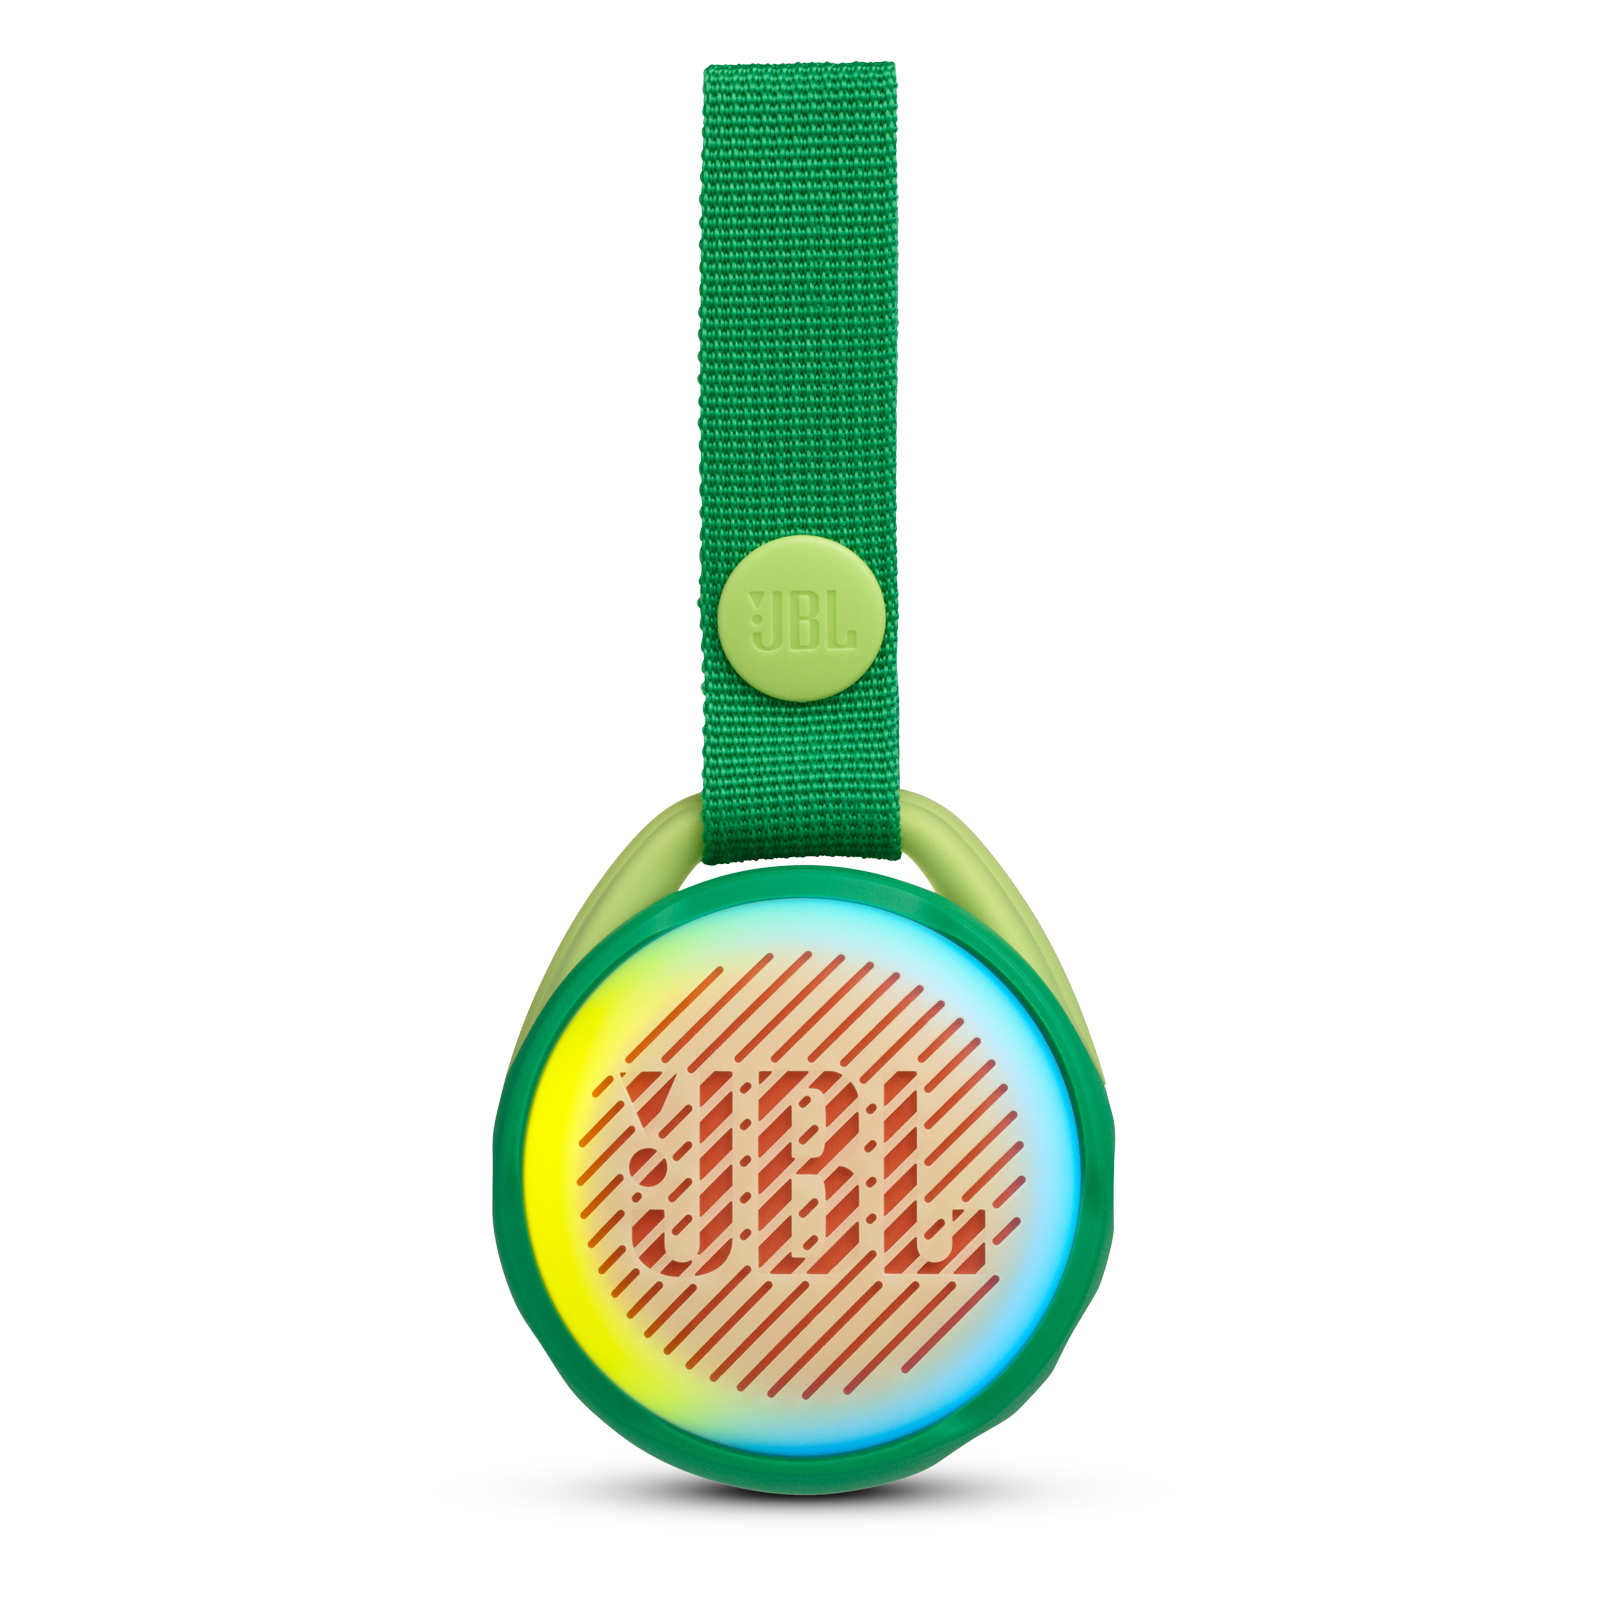 JBL JR POP - Froggy Green - Portable speaker for kids - Front